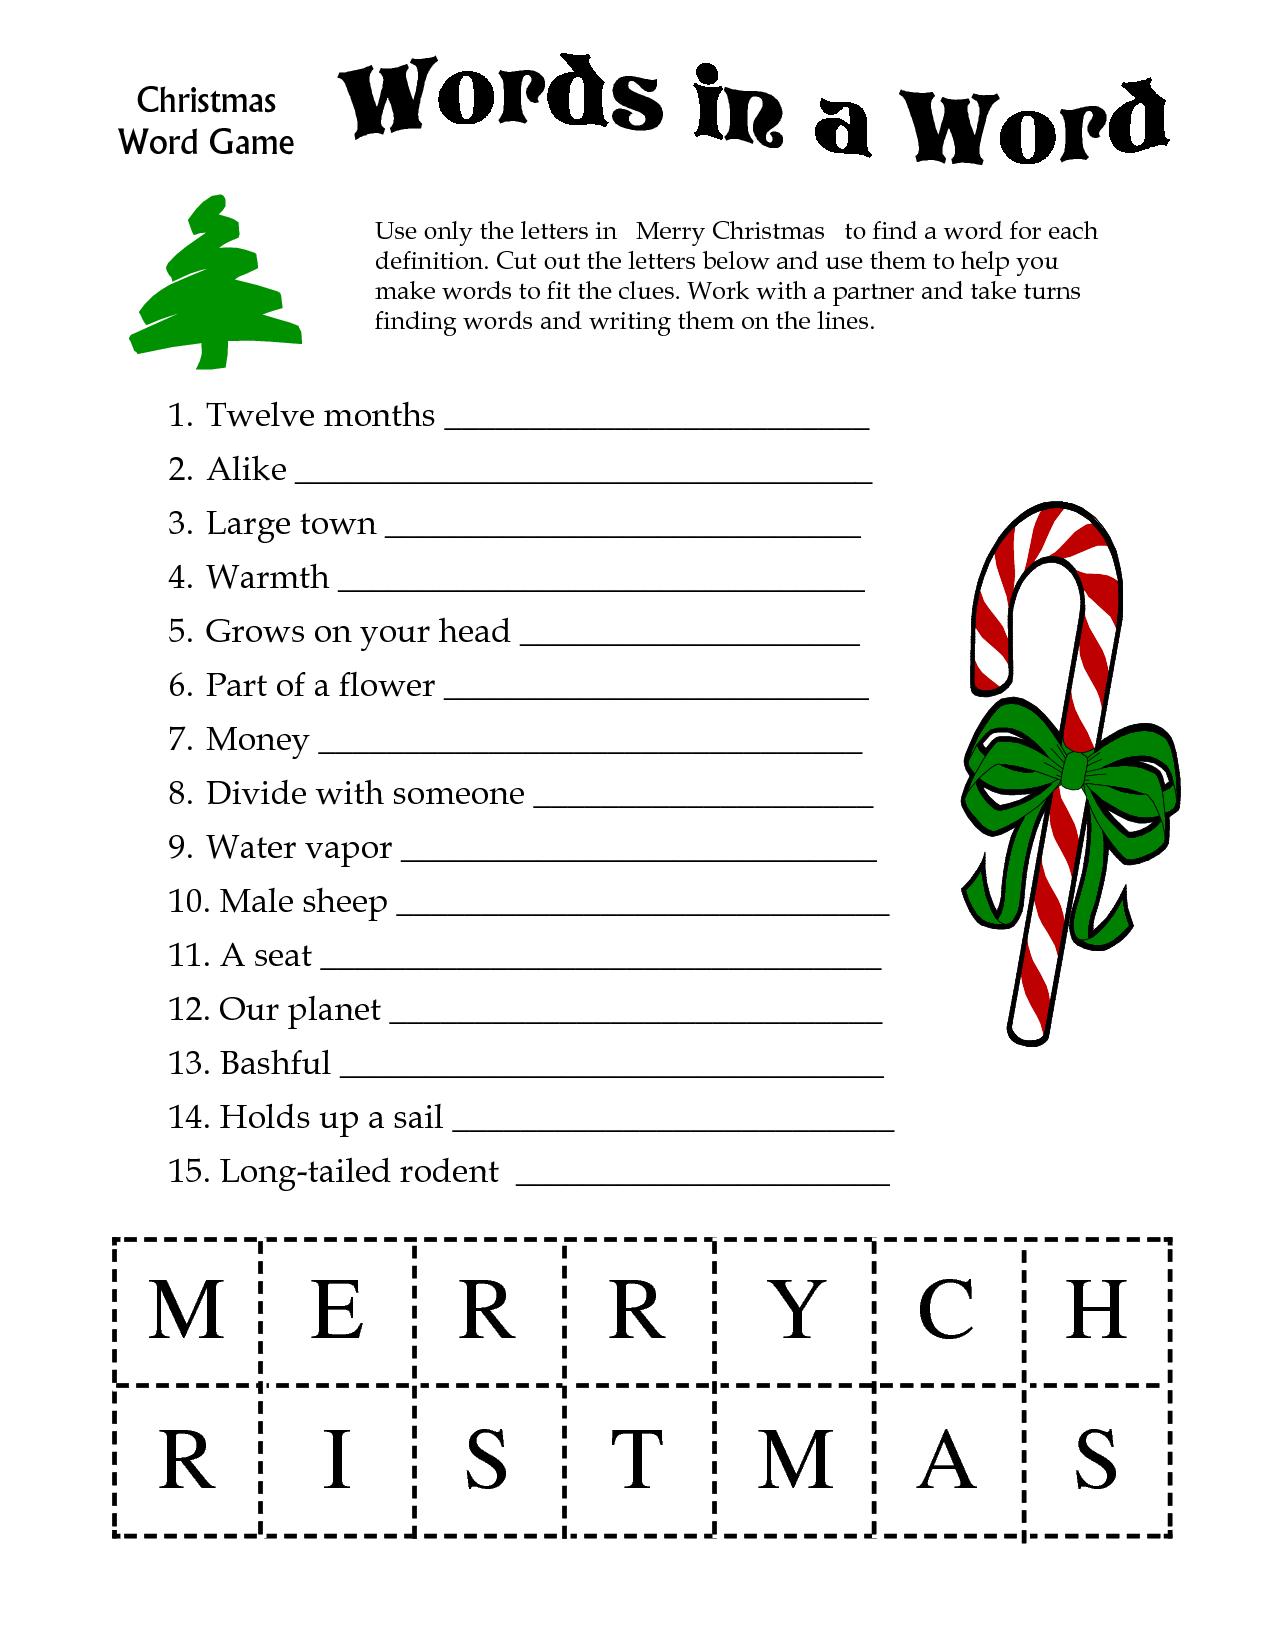 5 Images Of Free Printable Christmas Word Games | Printablee - Free Printable Christmas Puzzle Games